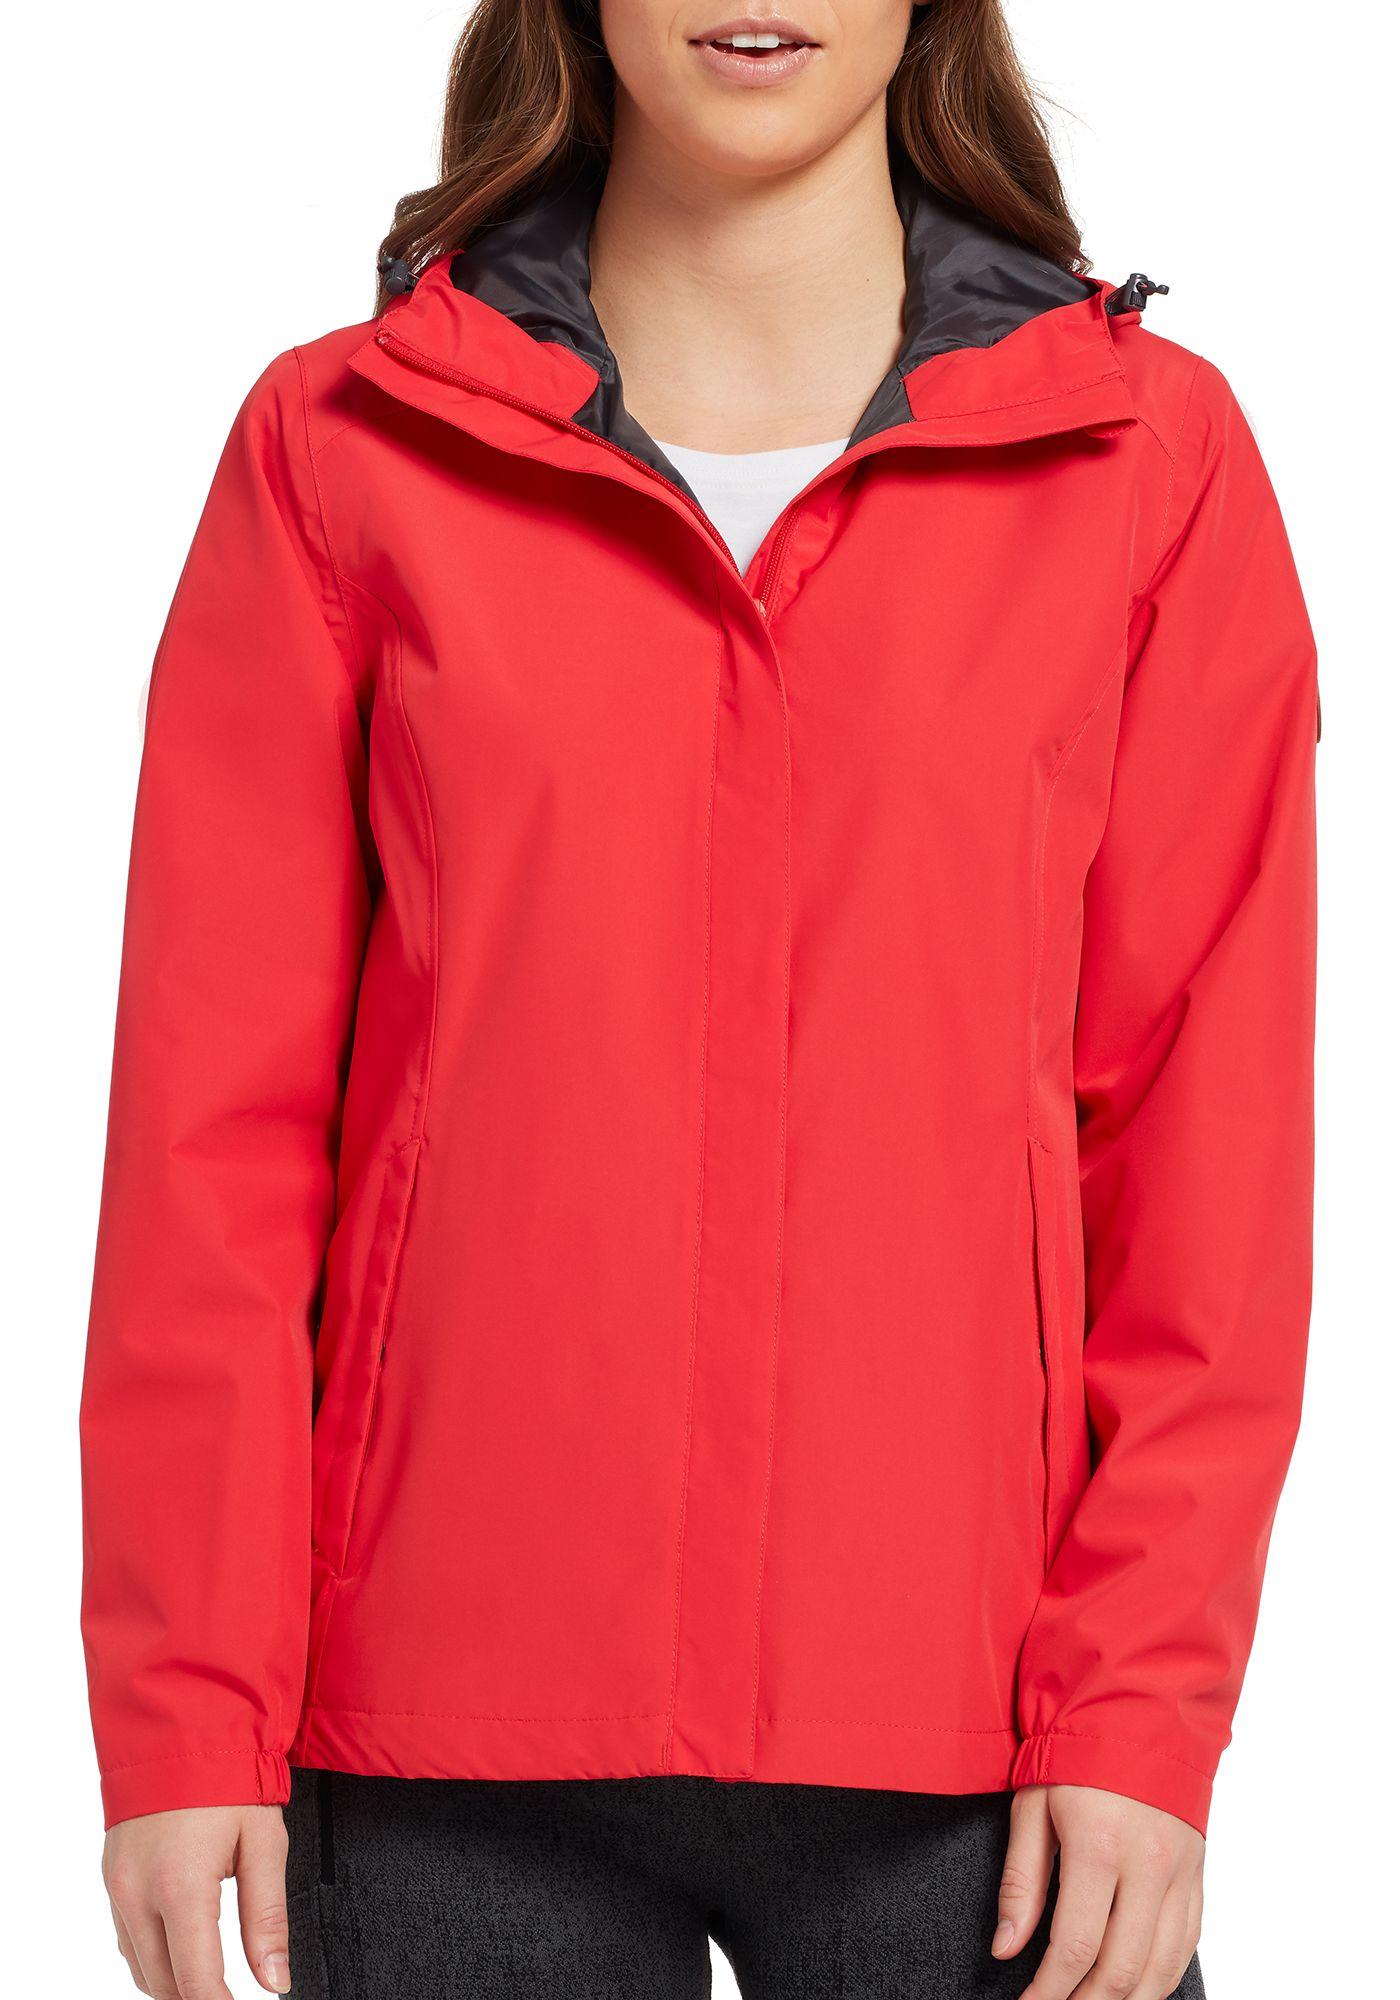 Alpine Design Women's Willow's Peak 2 Layer Rain Jacket